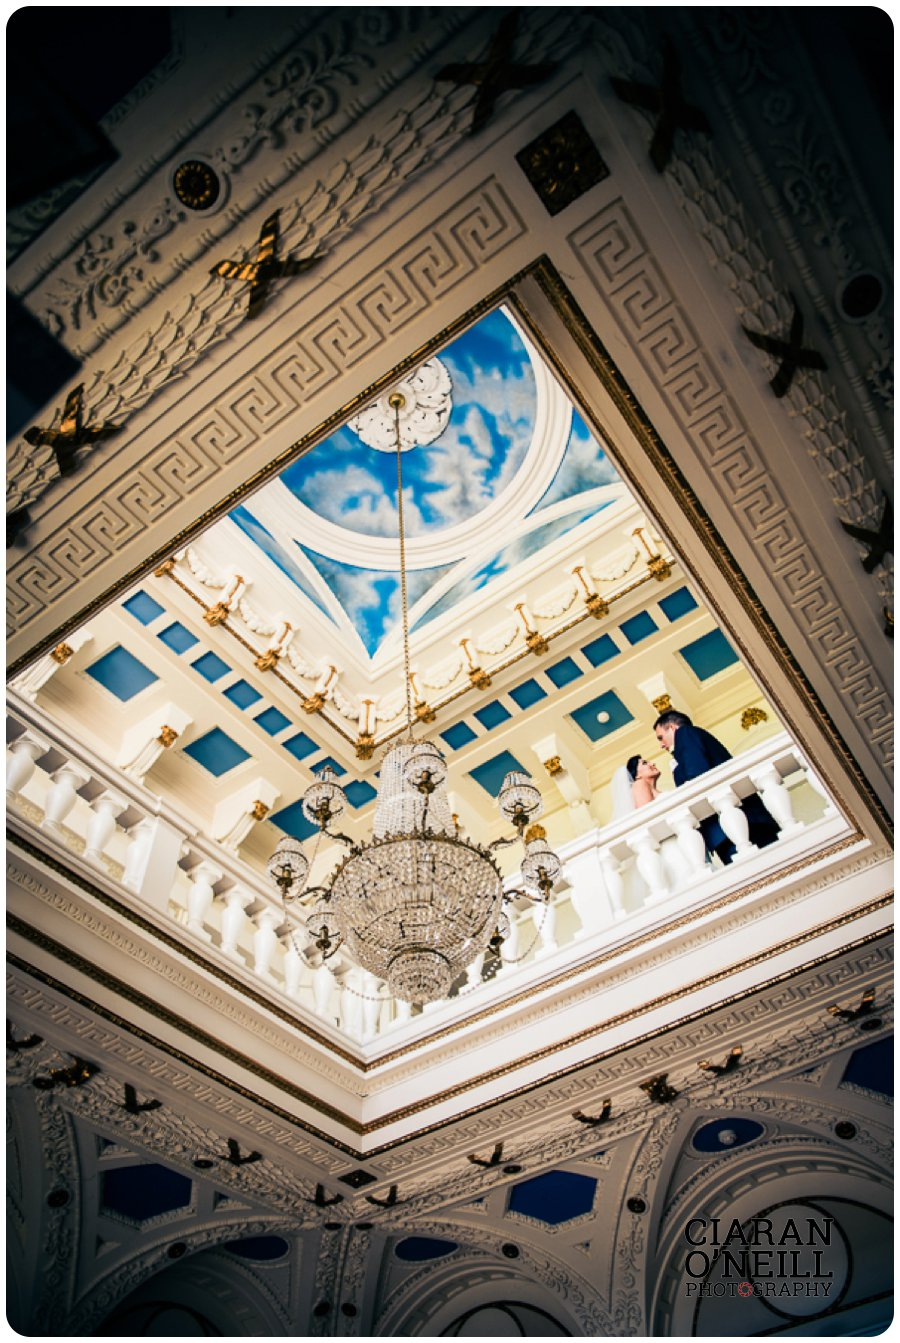 Lorna & David's wedding at the Manor House Hotel by Ciaran O'Neill Photography 18